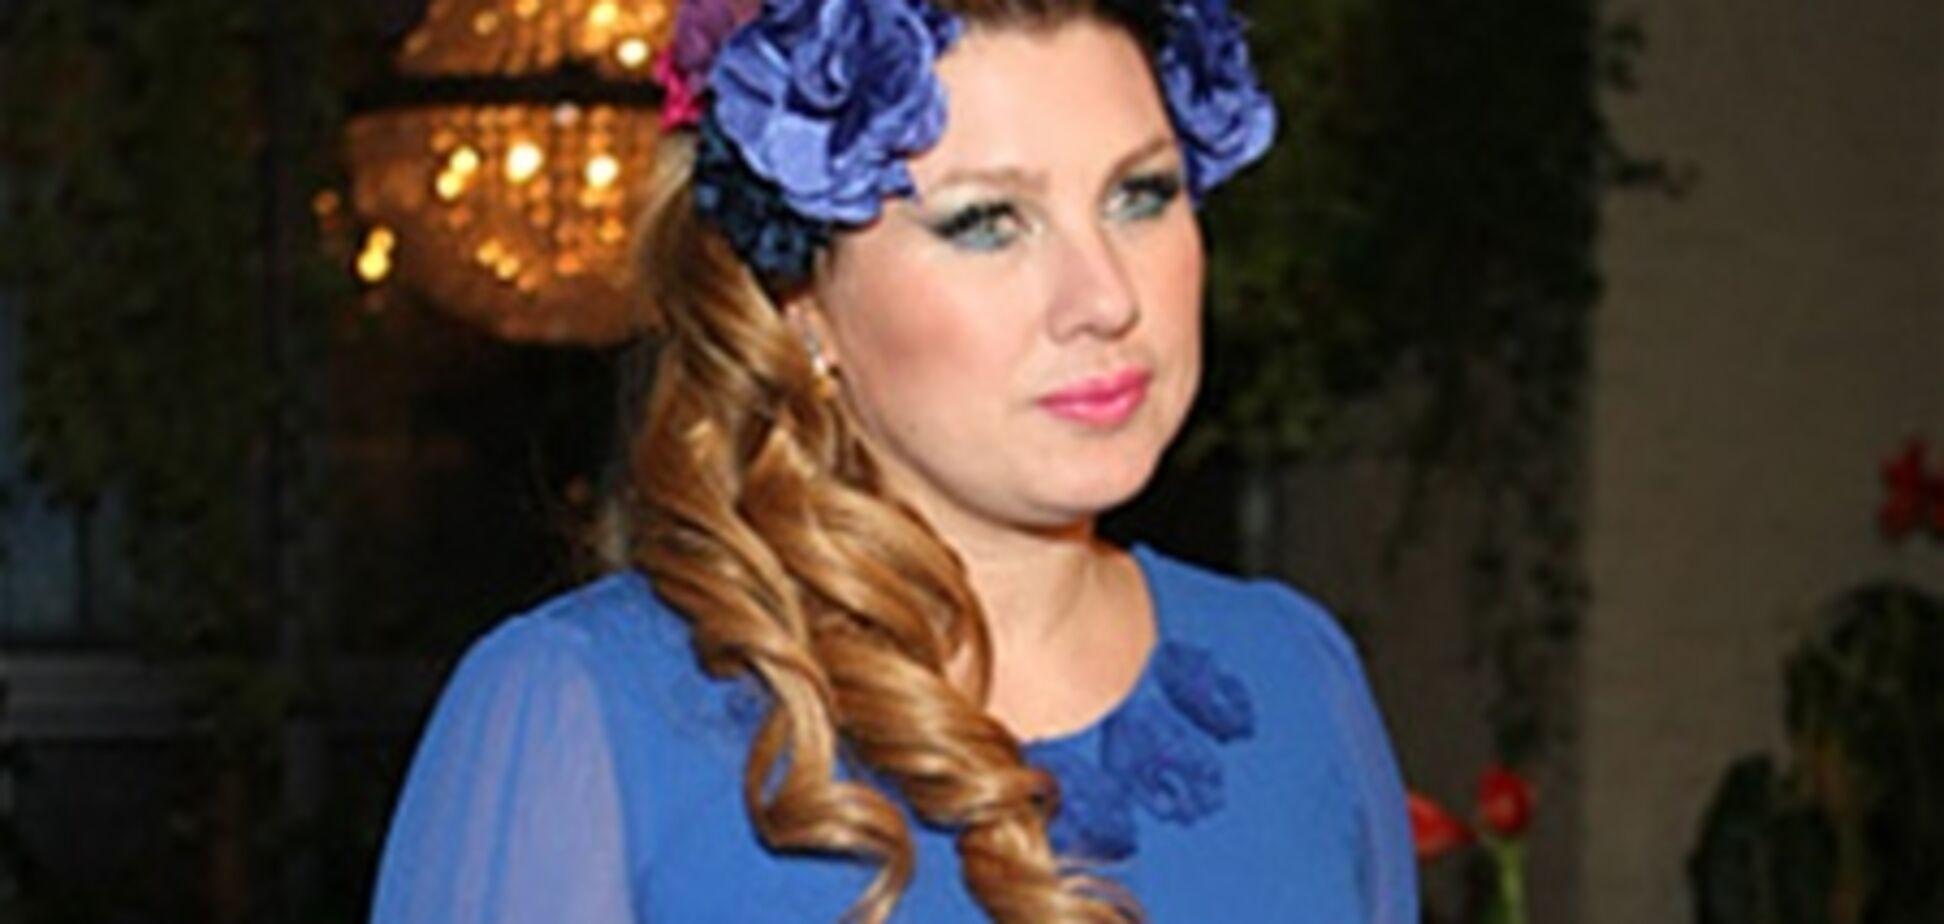 Єва Польна народила доньку солісту 'Чай вдвоем'